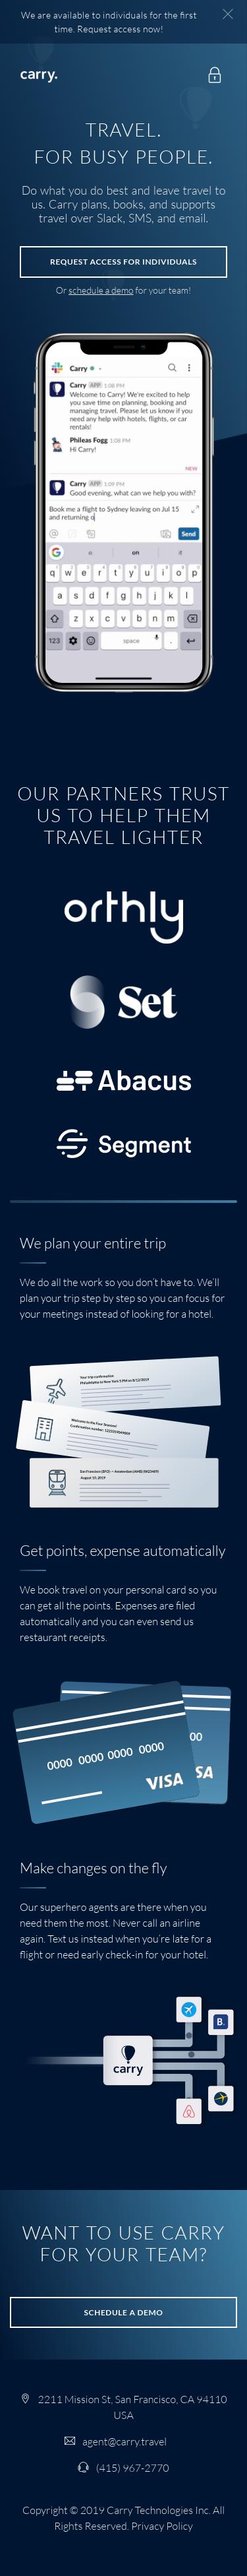 Example of Design for Travel, Mobile Landing Page by carry.travel | Mobile Landing Page Design